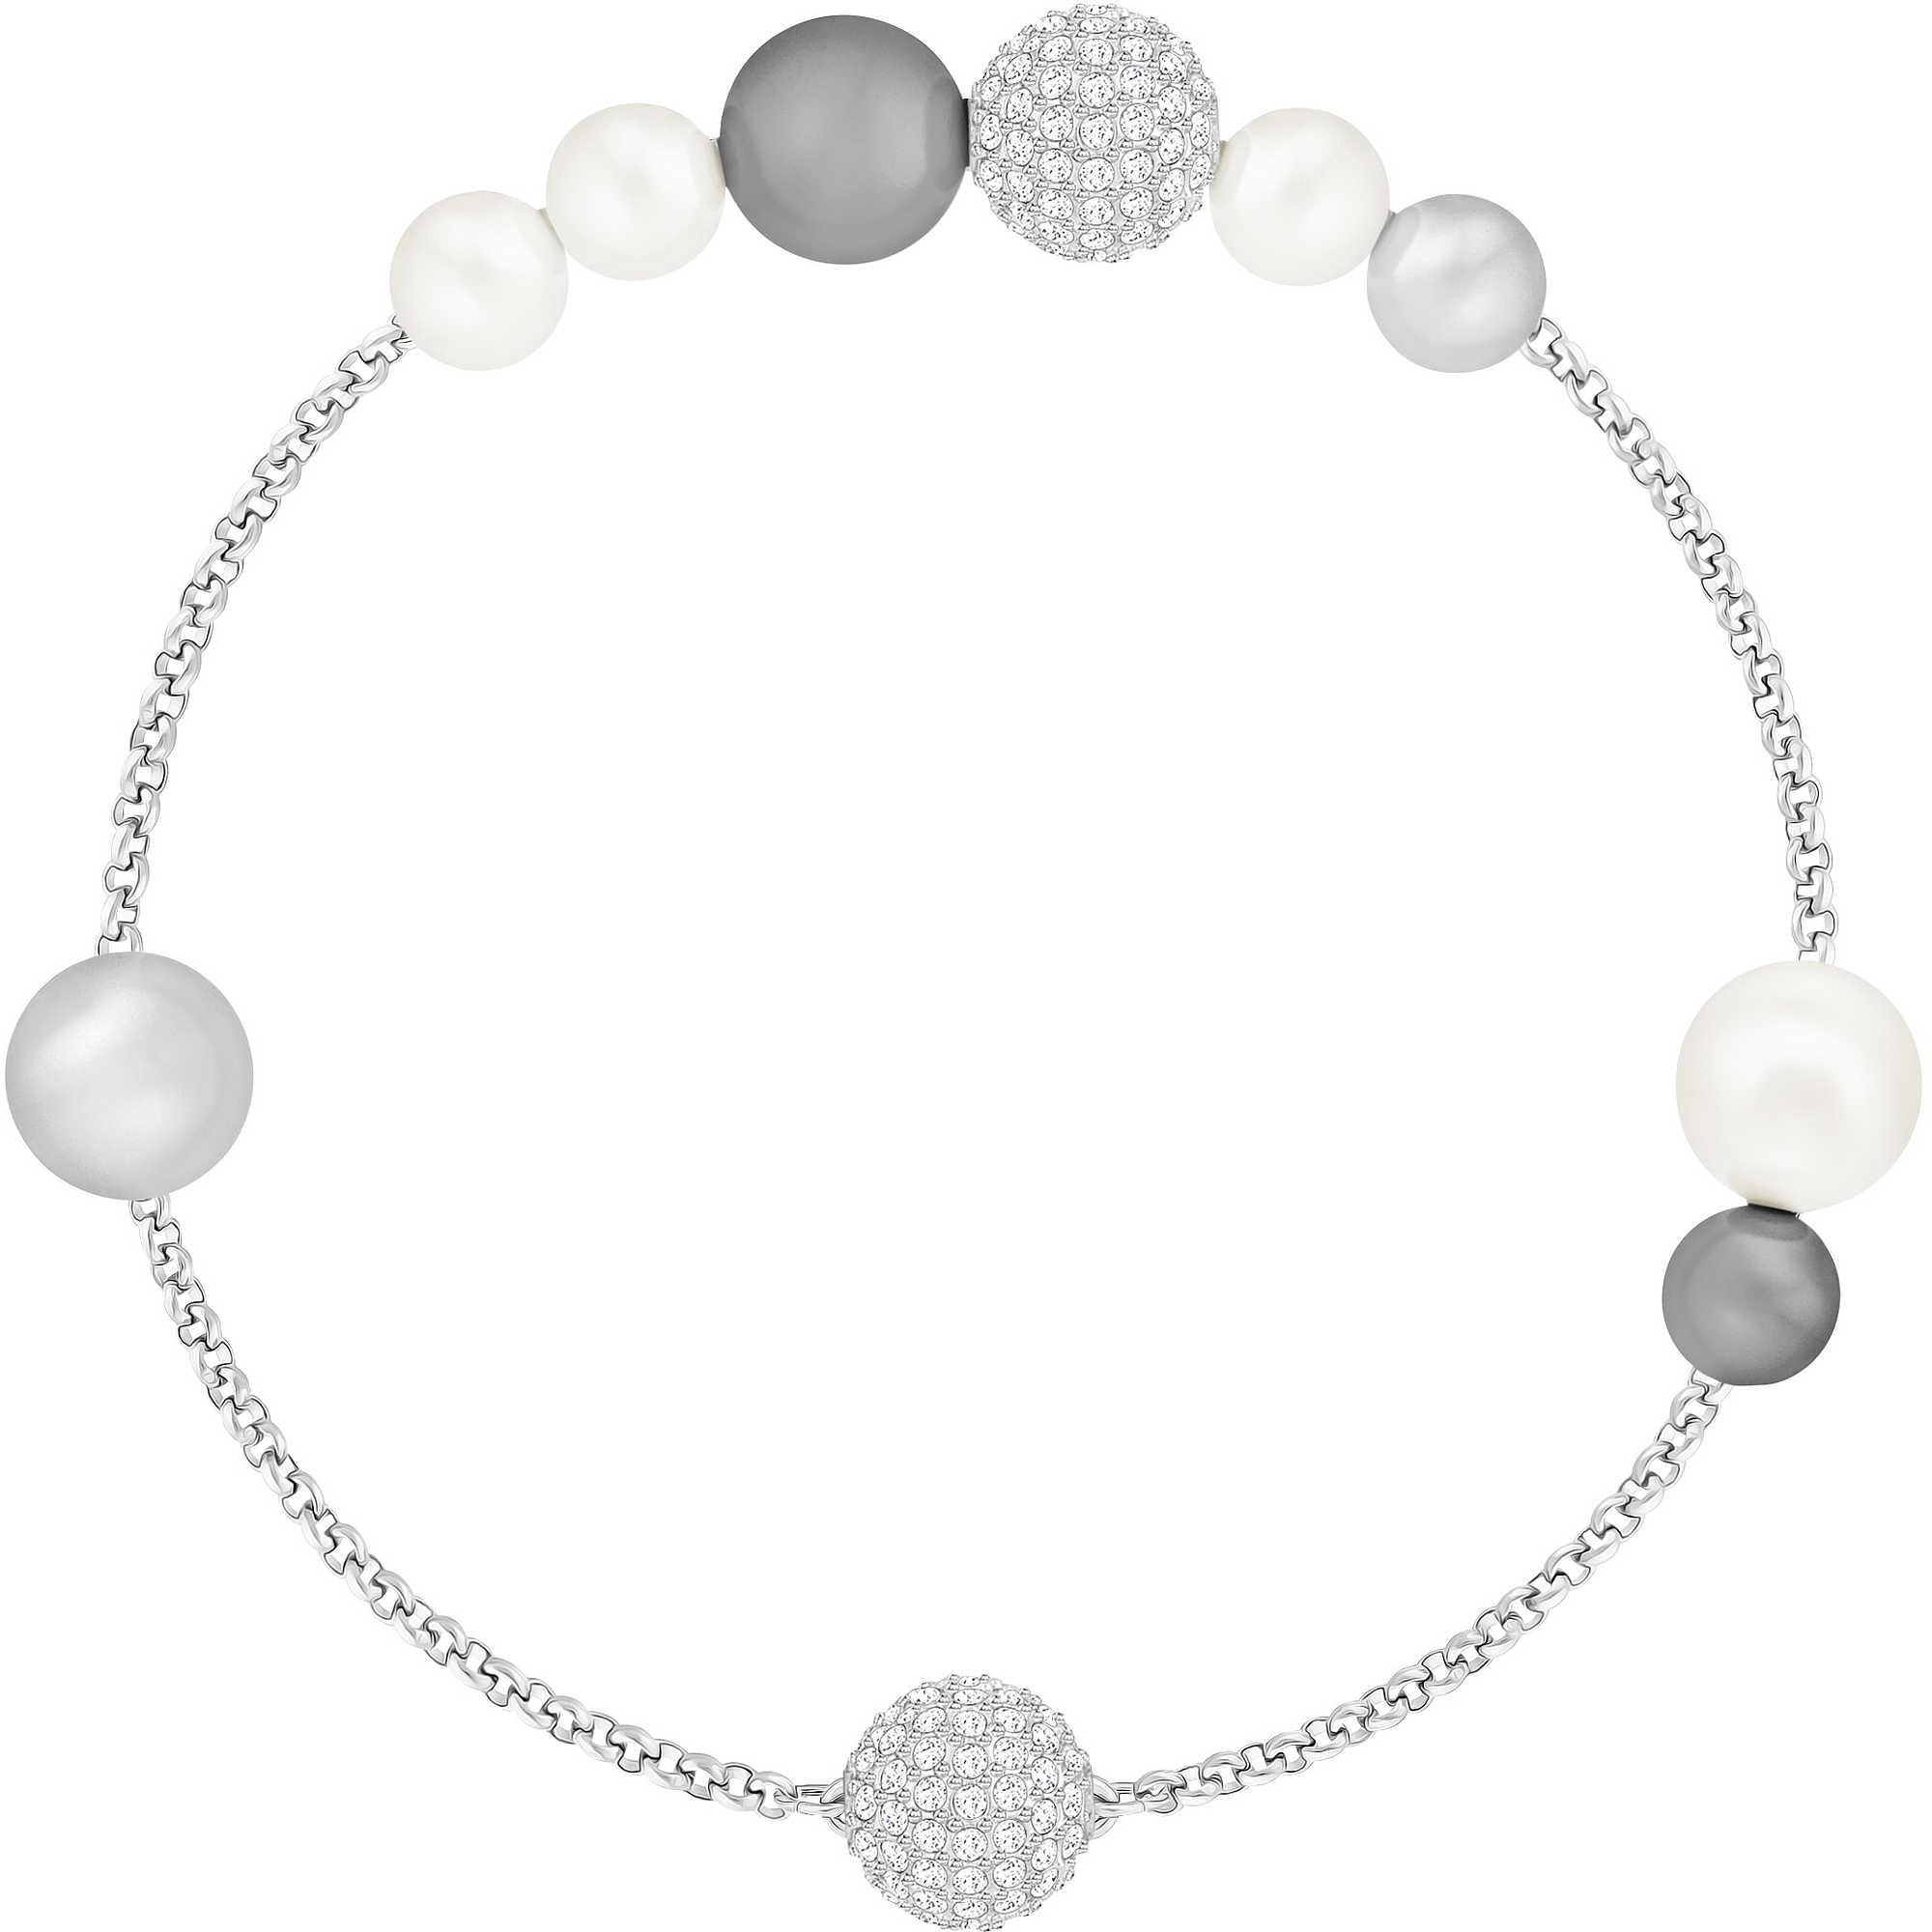 Souvent bracelet woman jewellery Swarovski Remix 5365739 bracelets Swarovski LL03